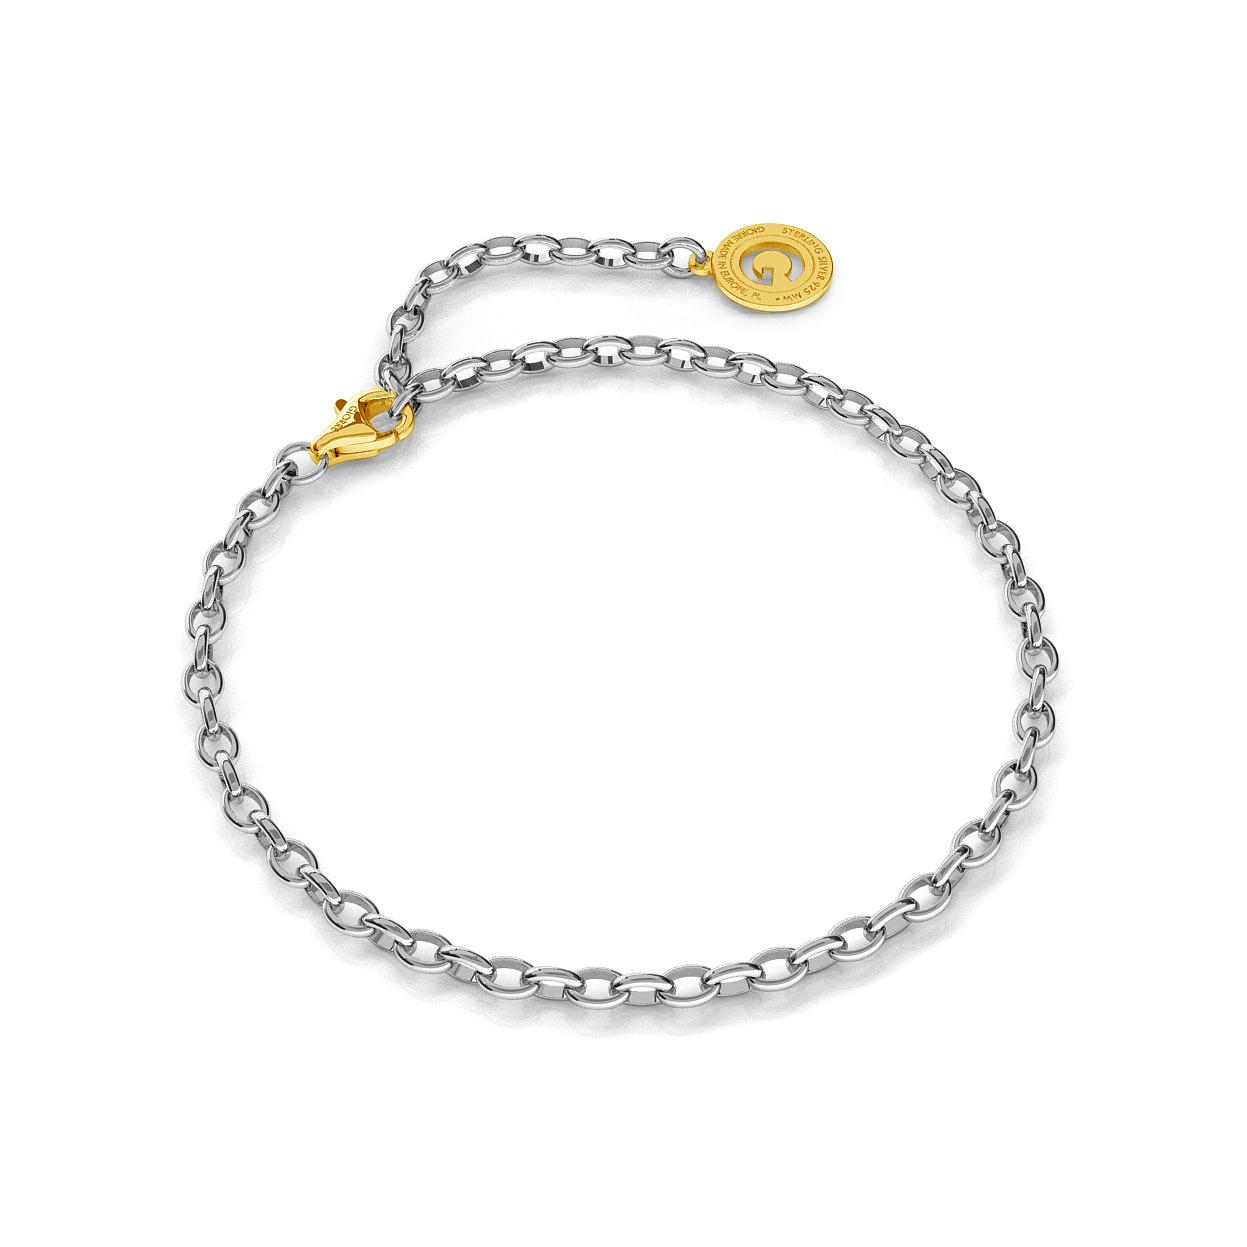 Pulsera de plata 16-24 cm rodio claro, cierre oro amarillo, enlace 4x3mm